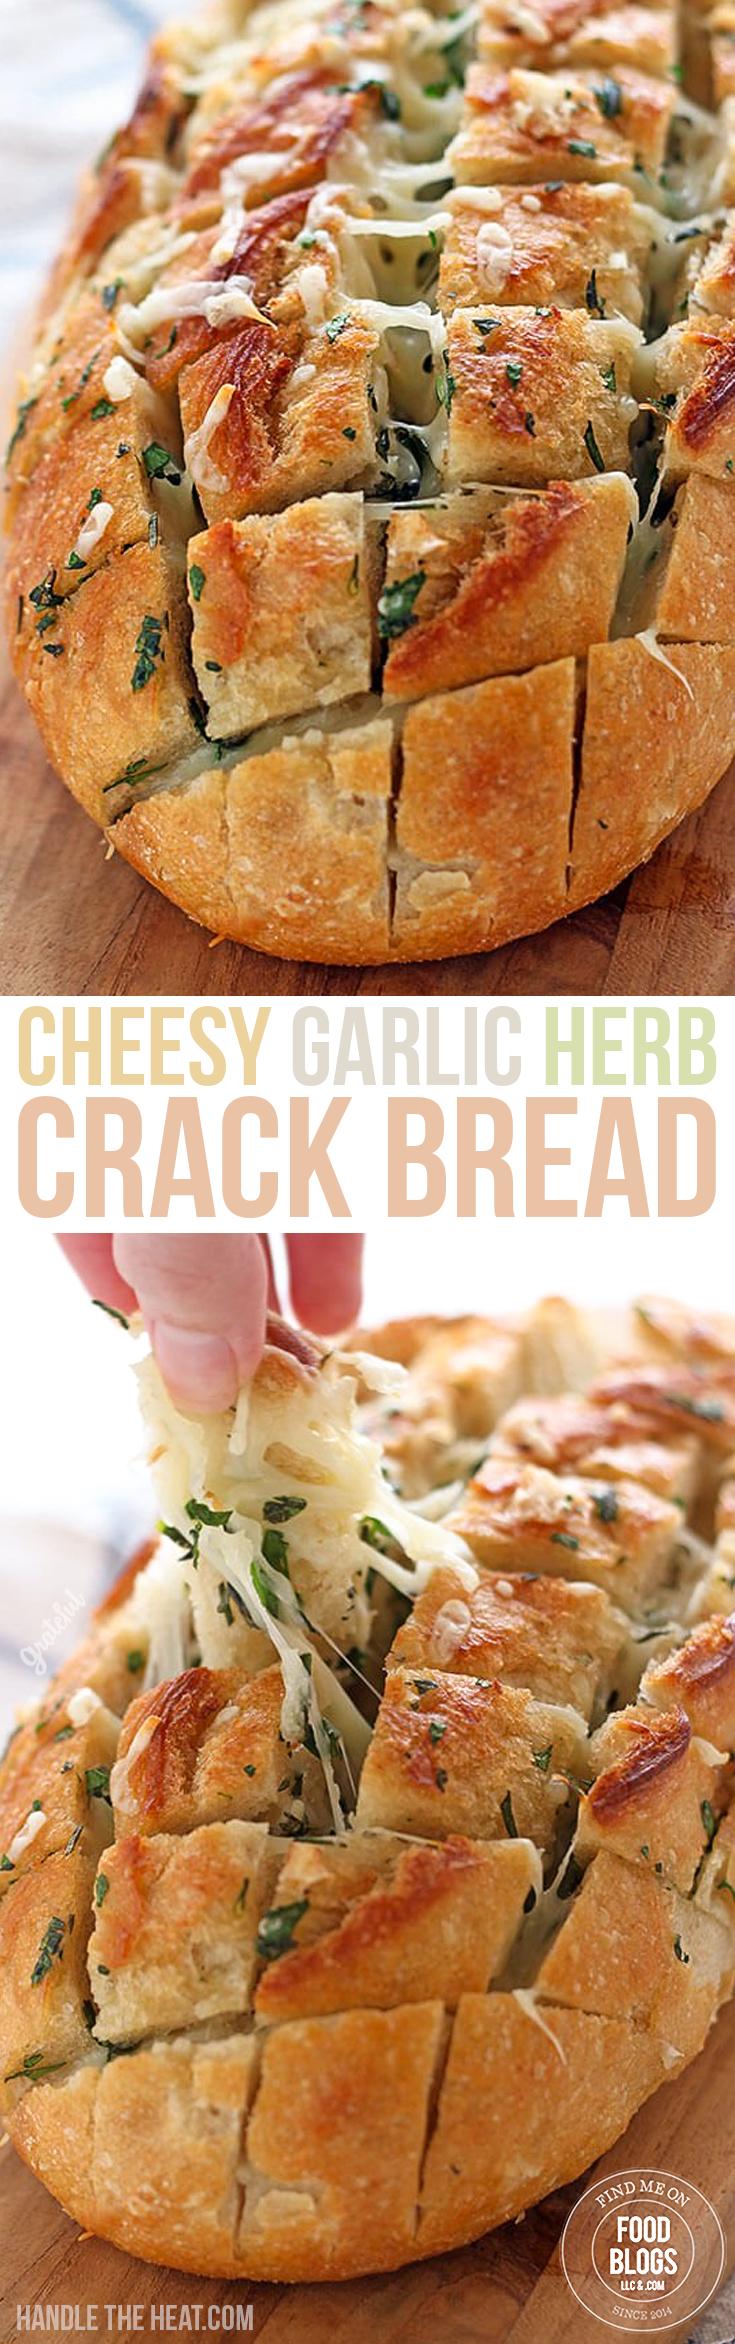 Cheesy Garlic Herb Crack Bread Recipe @FoodBlogs.com